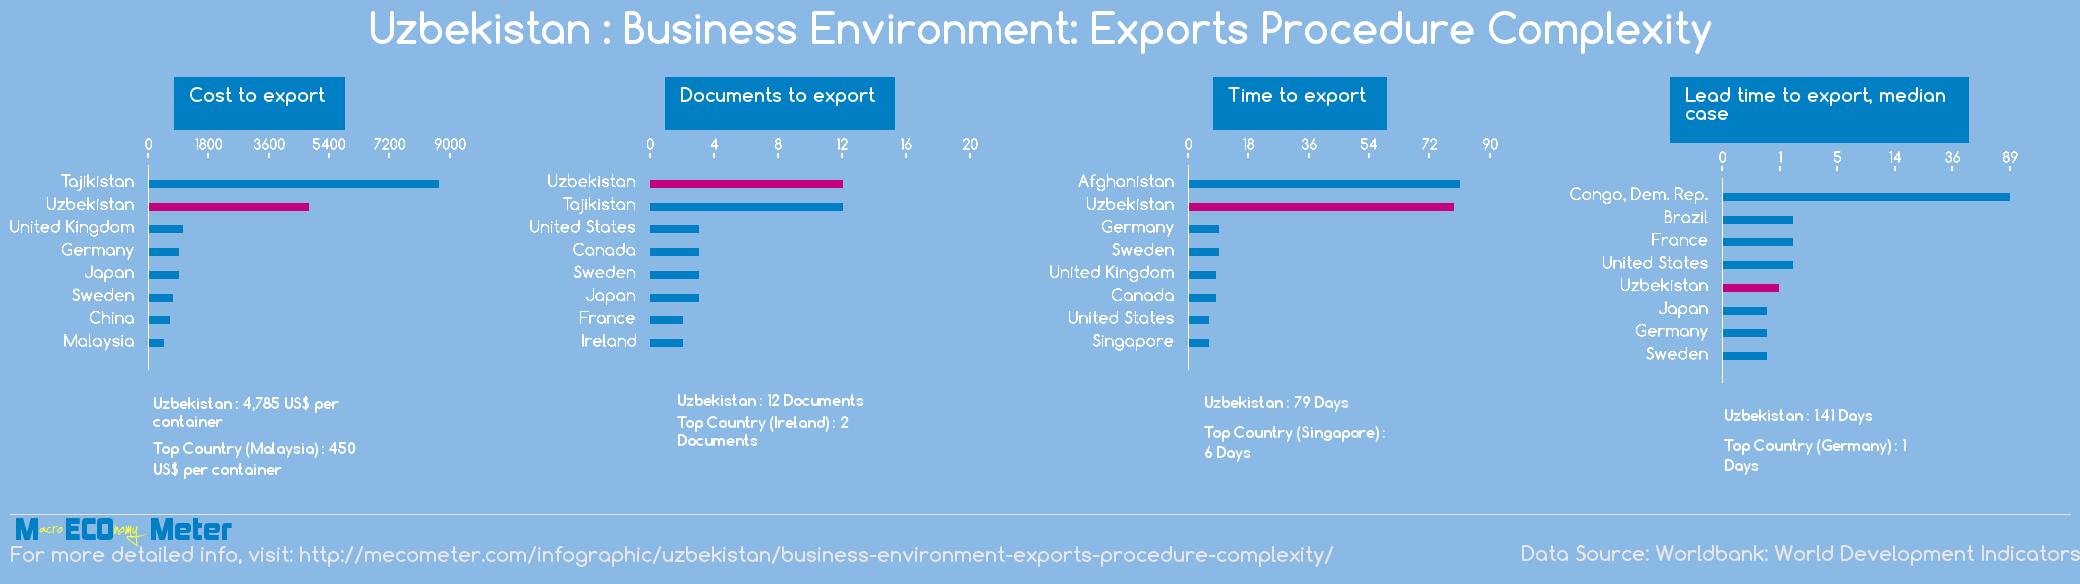 Uzbekistan : Business Environment: Exports Procedure Complexity